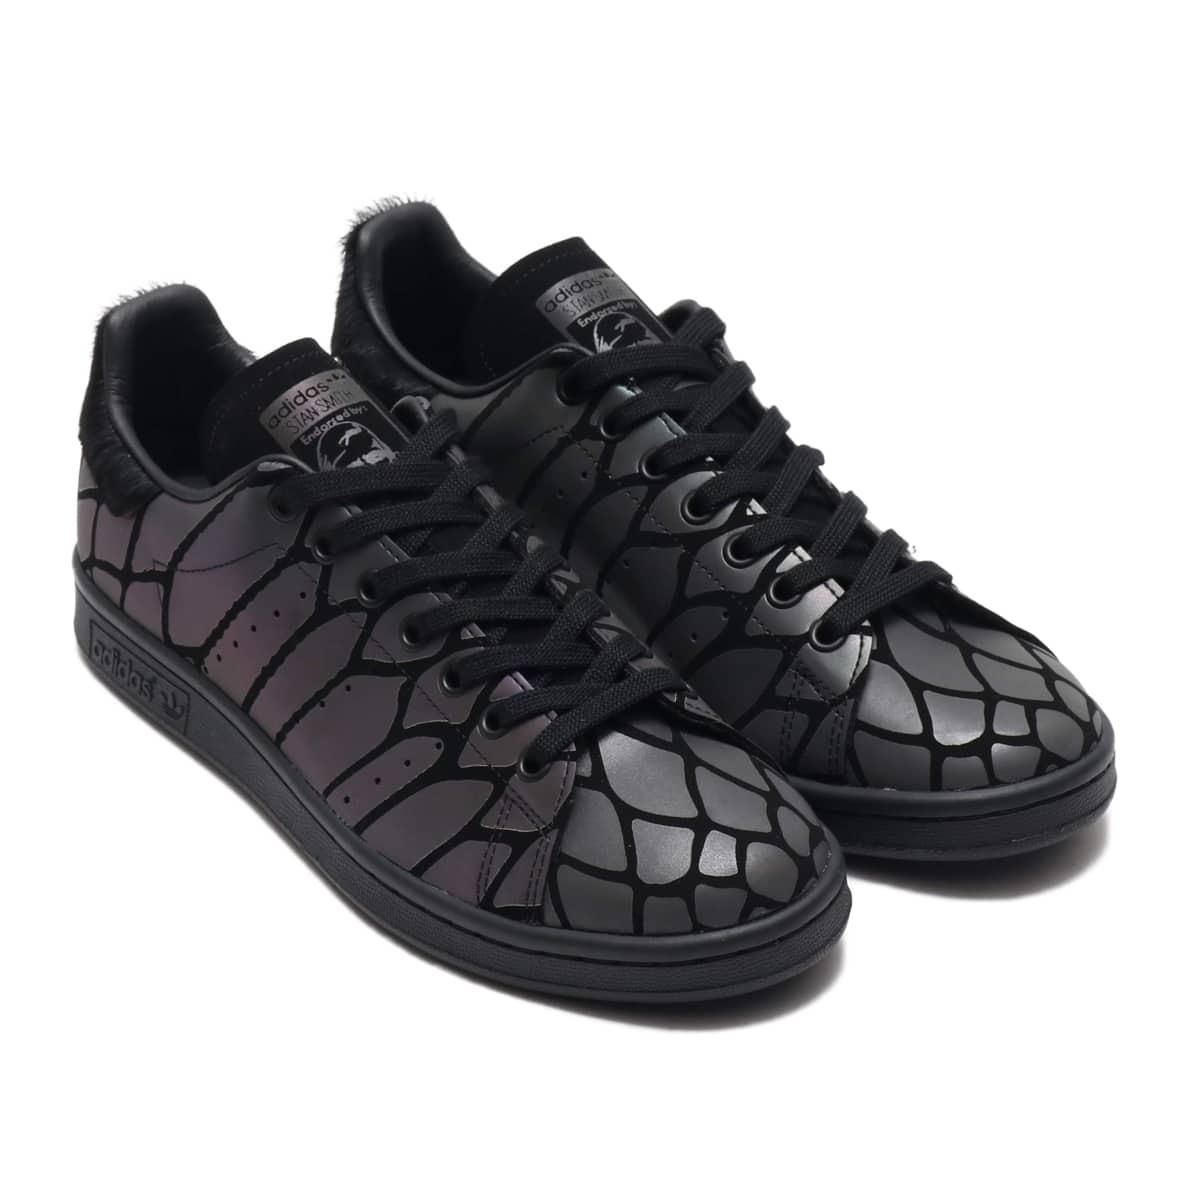 adidas STAN SMITH CORE BLACK/CORE BLACK/CORE BLACK 19FW-S_photo_large